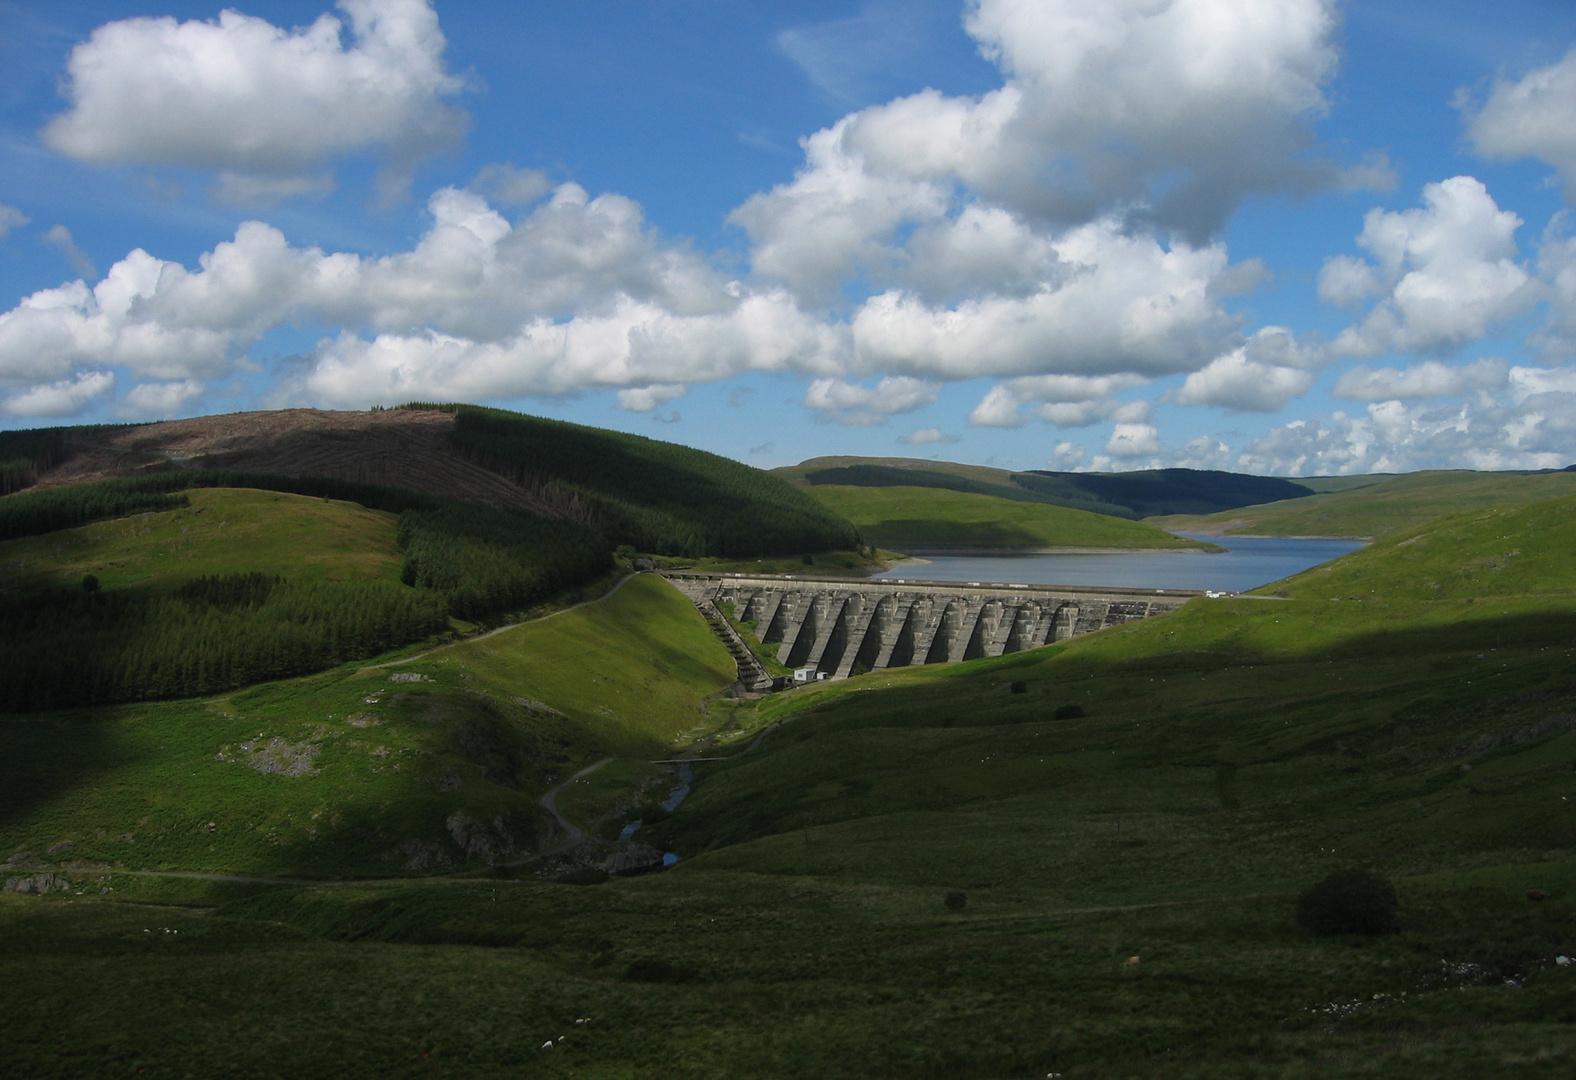 Damm in Wales